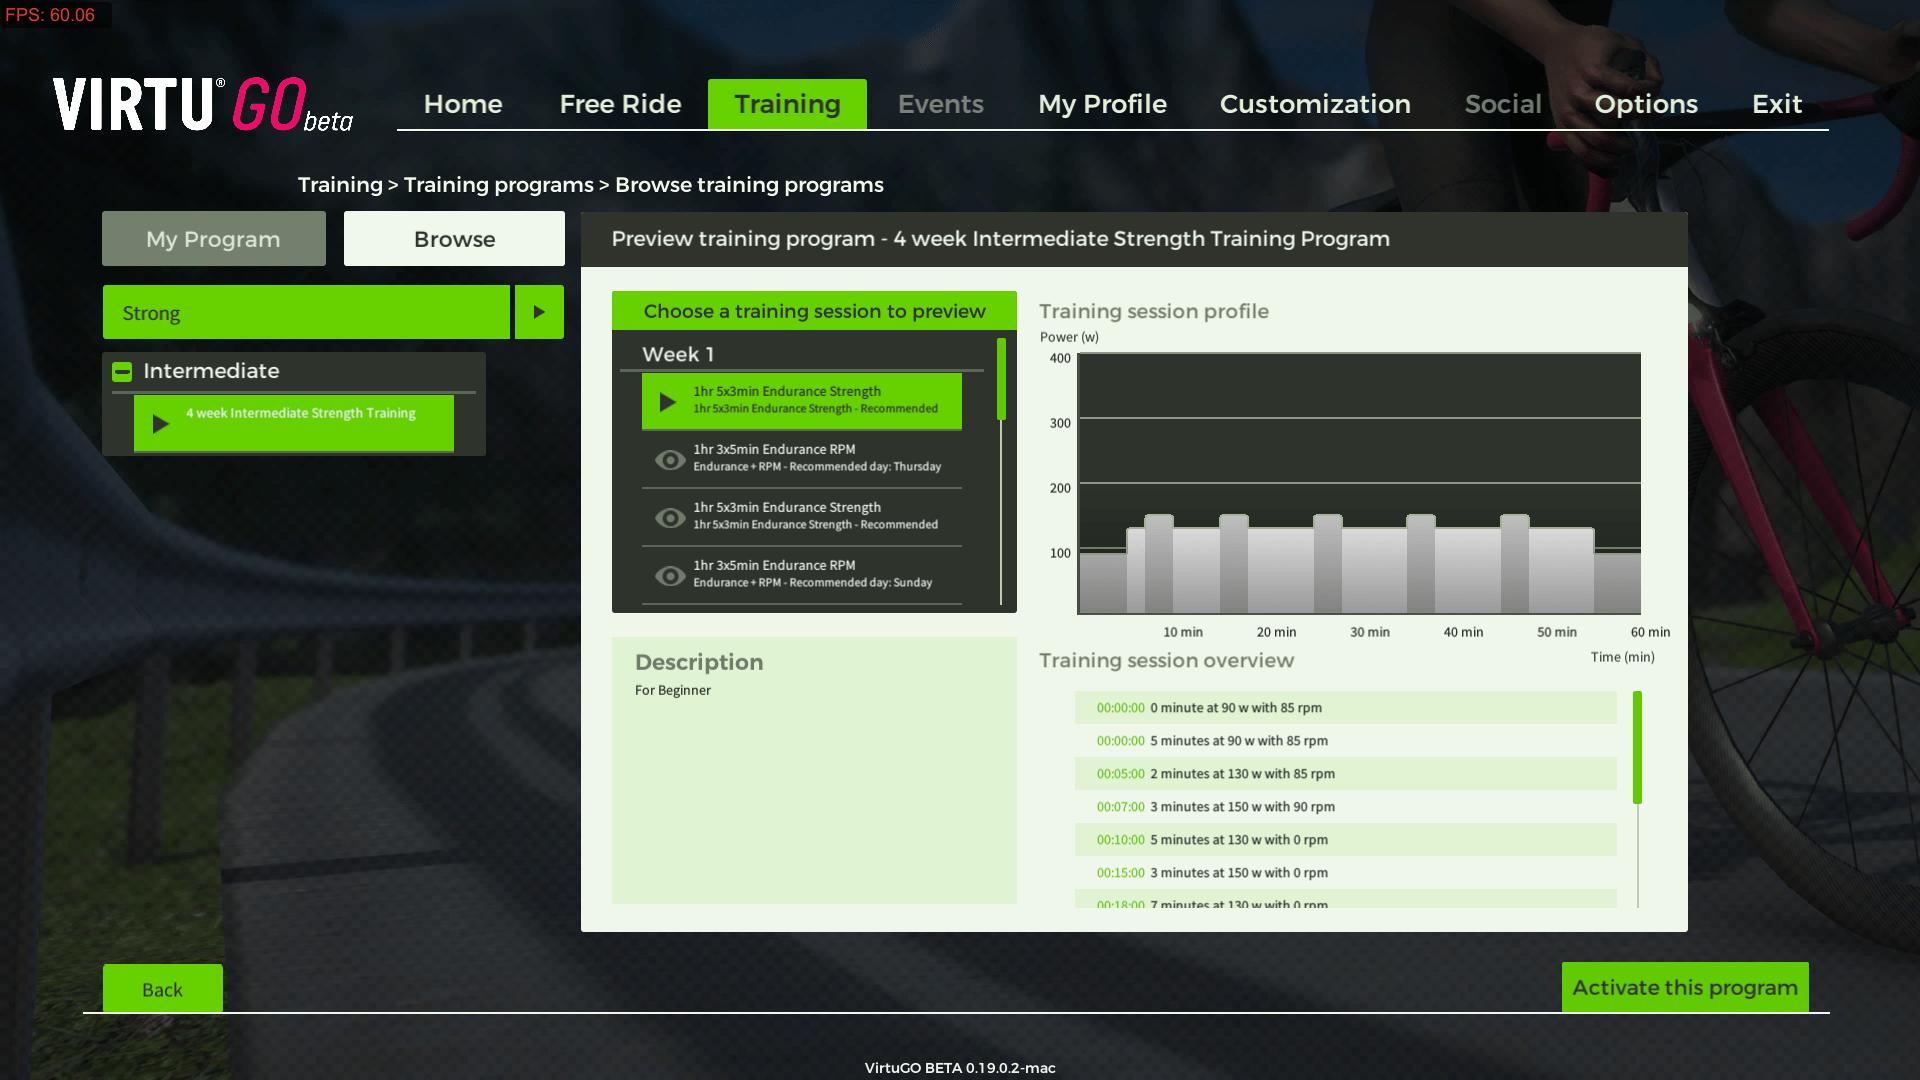 VirtuGO Beta - Built-in My Training Program - For STRONG riders